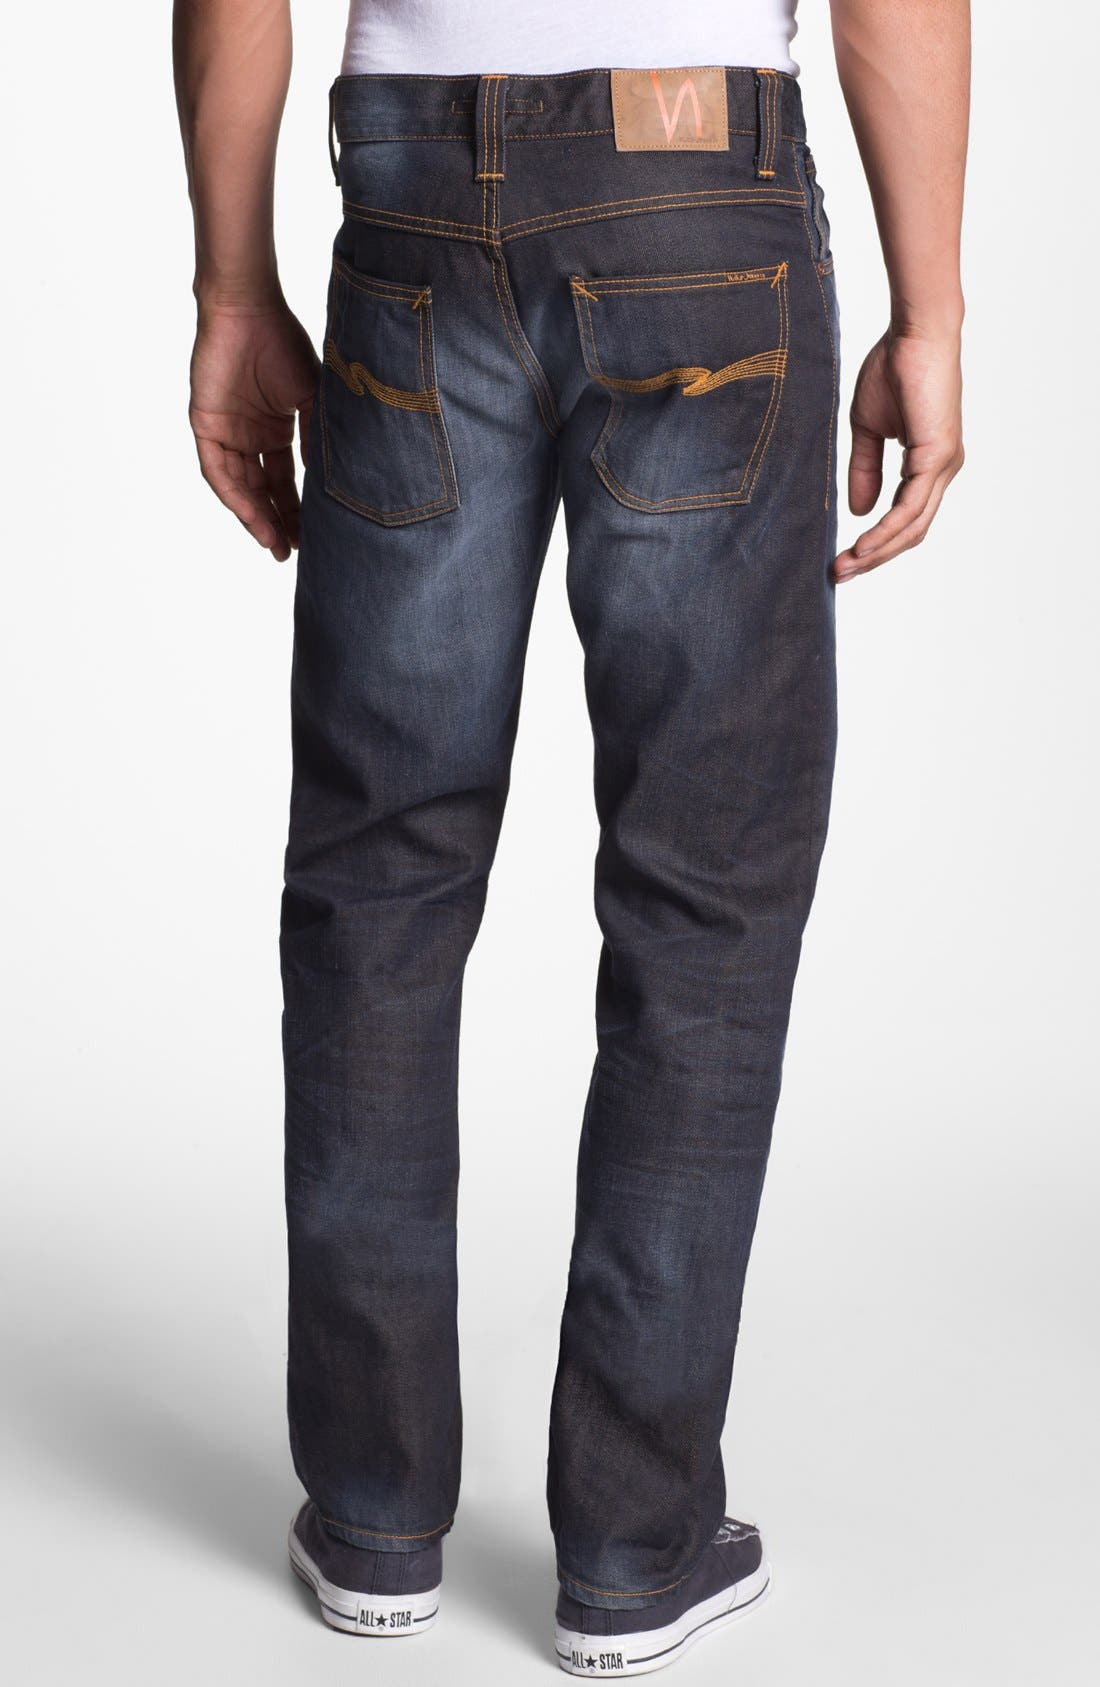 Alternate Image 1 Selected - Nudie Jeans 'Average Joe' Straight Leg Jeans (Organic Steve Replica)